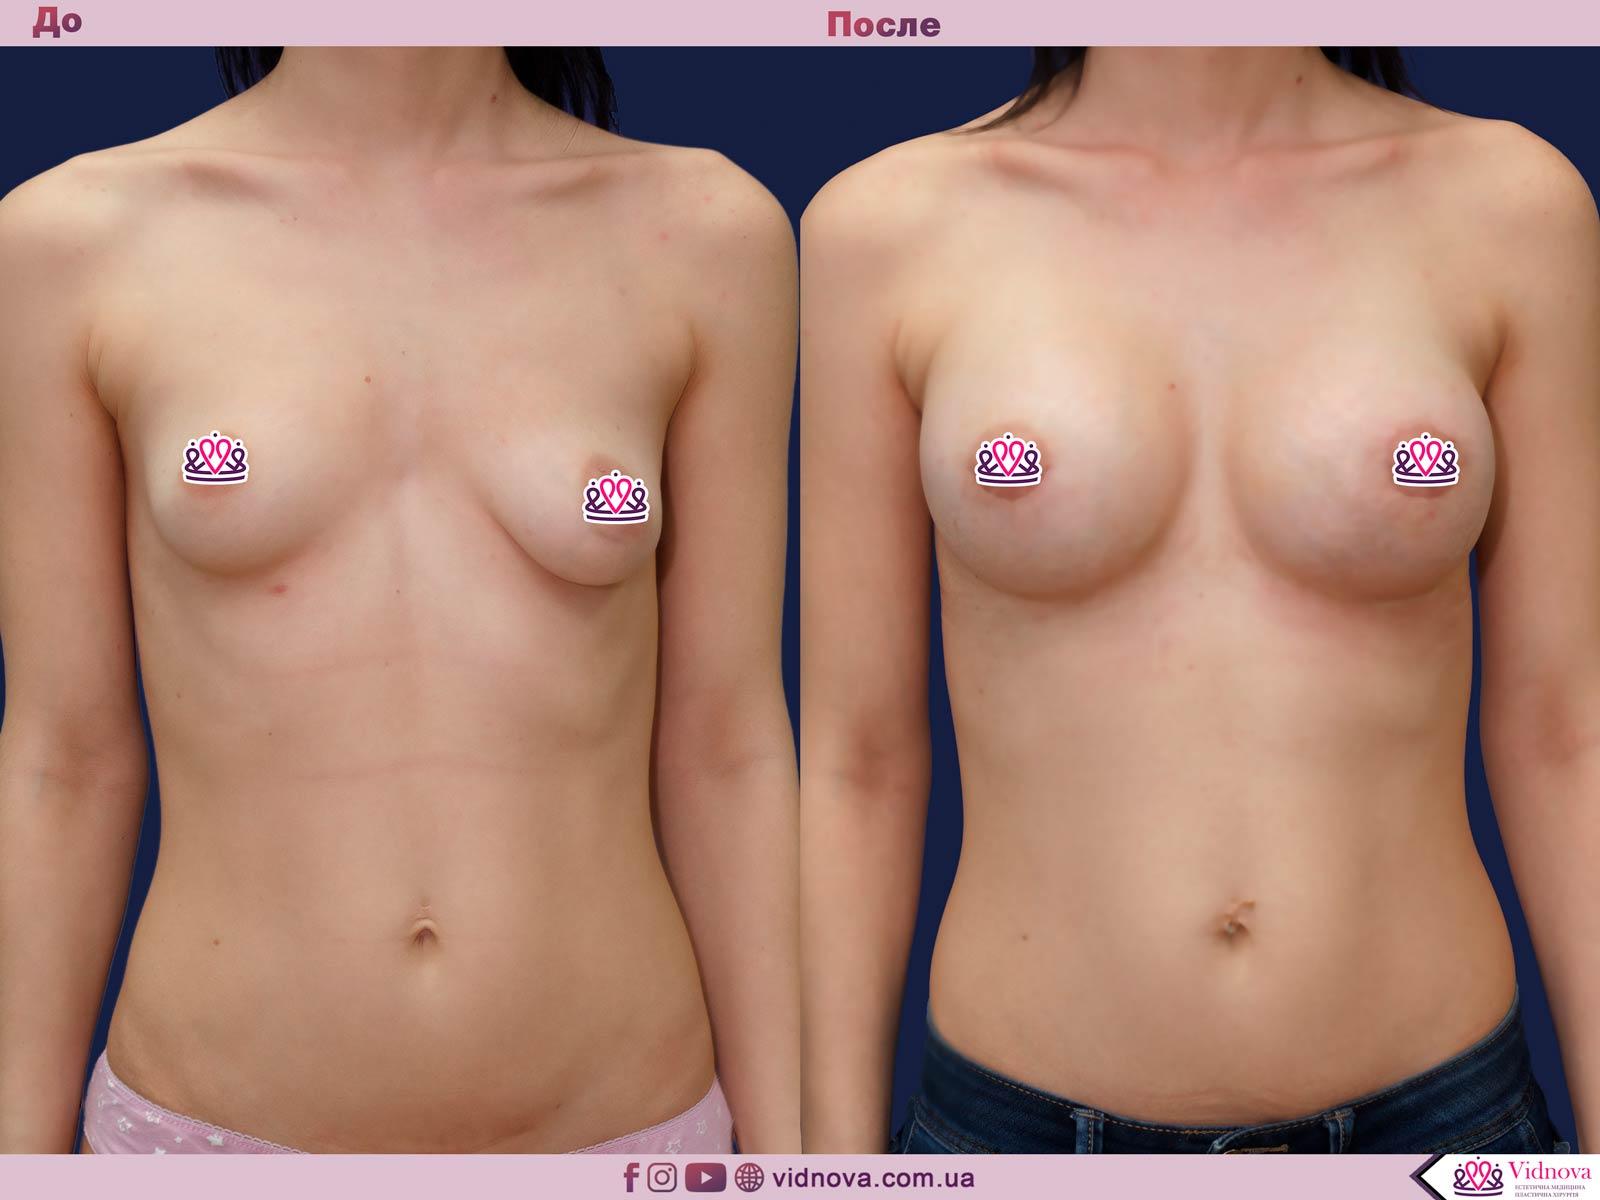 Подтяжка груди: Фото ДО и ПОСЛЕ - Пример №23-1 - Клиника Vidnova